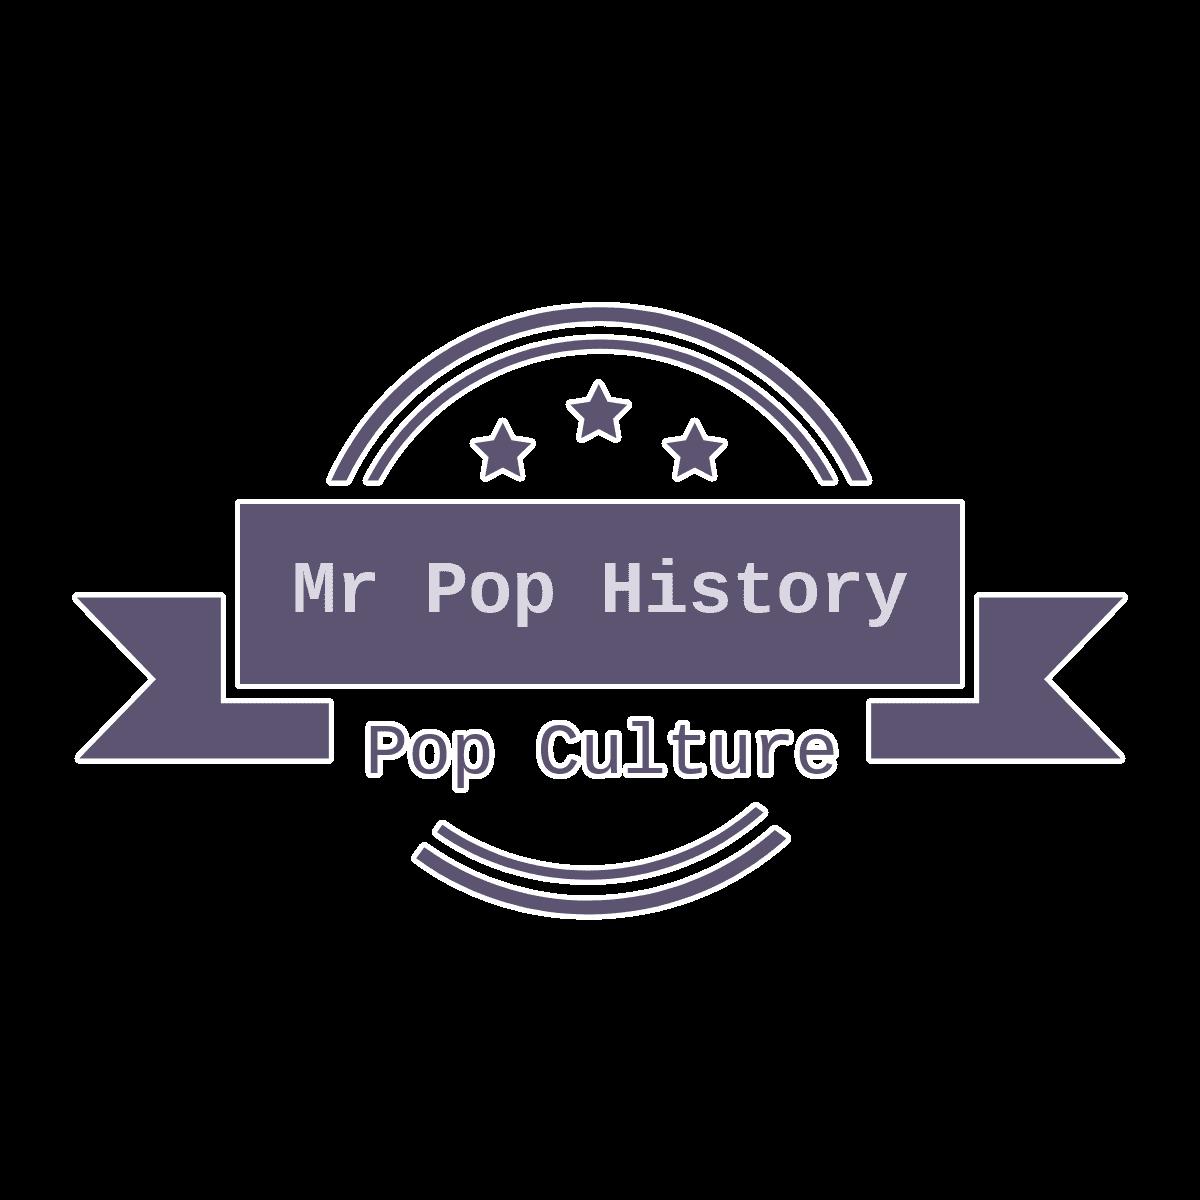 Mr Pop History